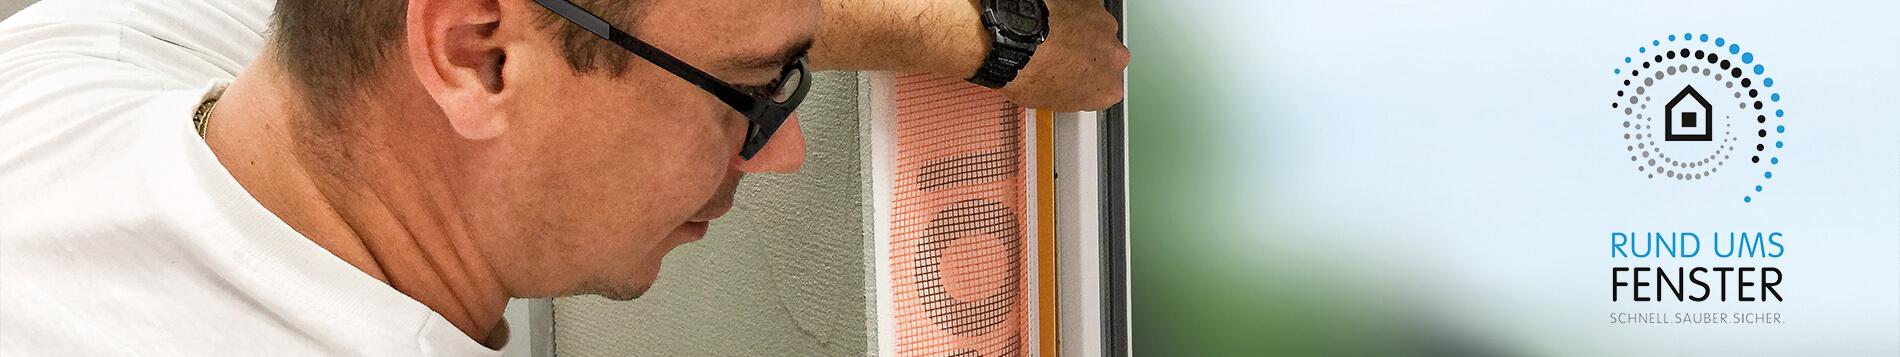 Anschlusse An Fenster Turen Anputzleisten Fugendichtbander